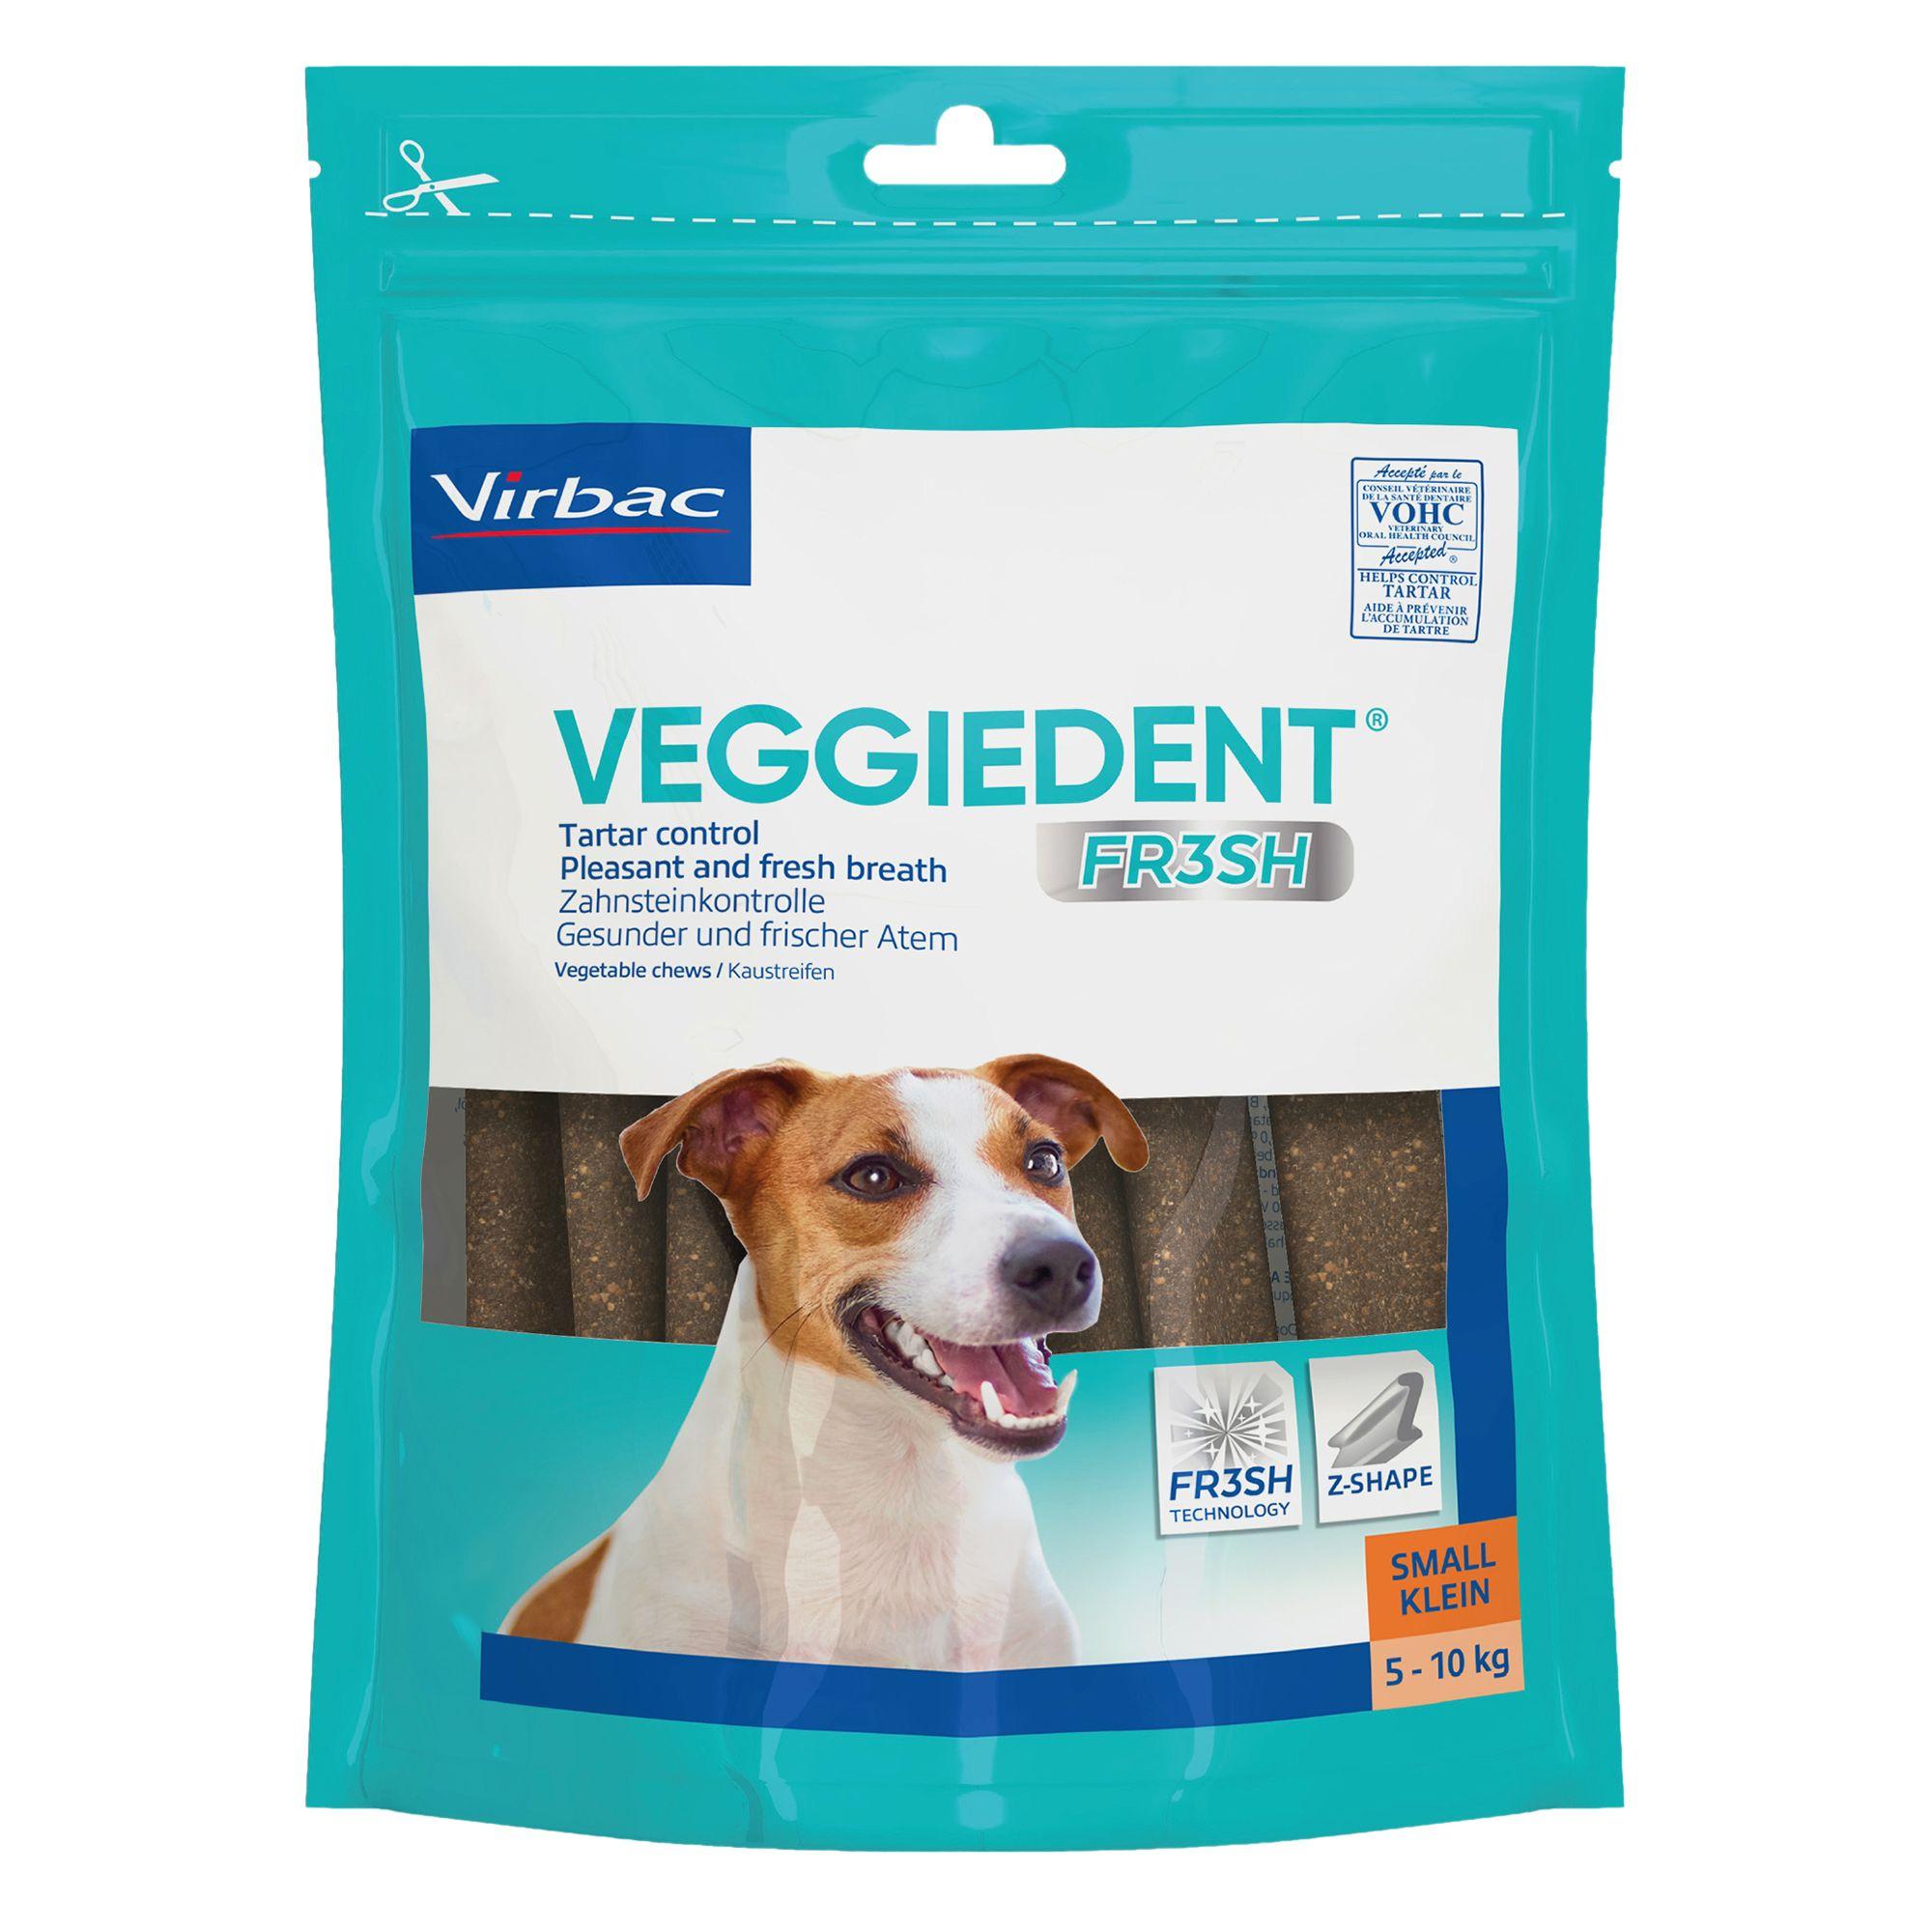 Virbac C.e.t Vegdent Tarter Control Dog Chews Size Small